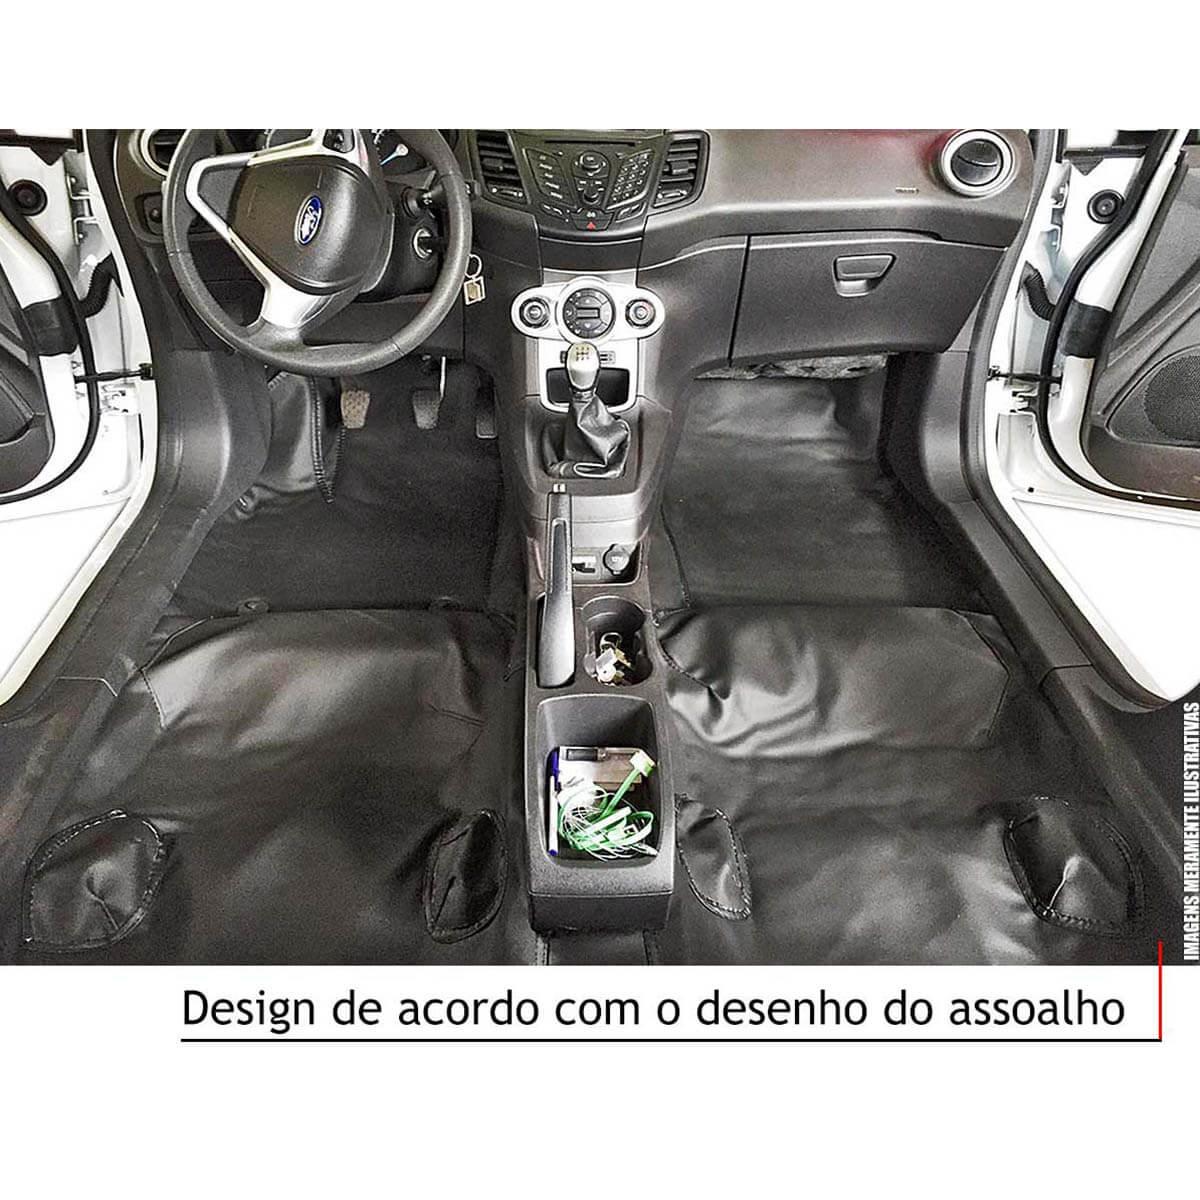 Capa de assoalho Fiat Toro 2017 2018